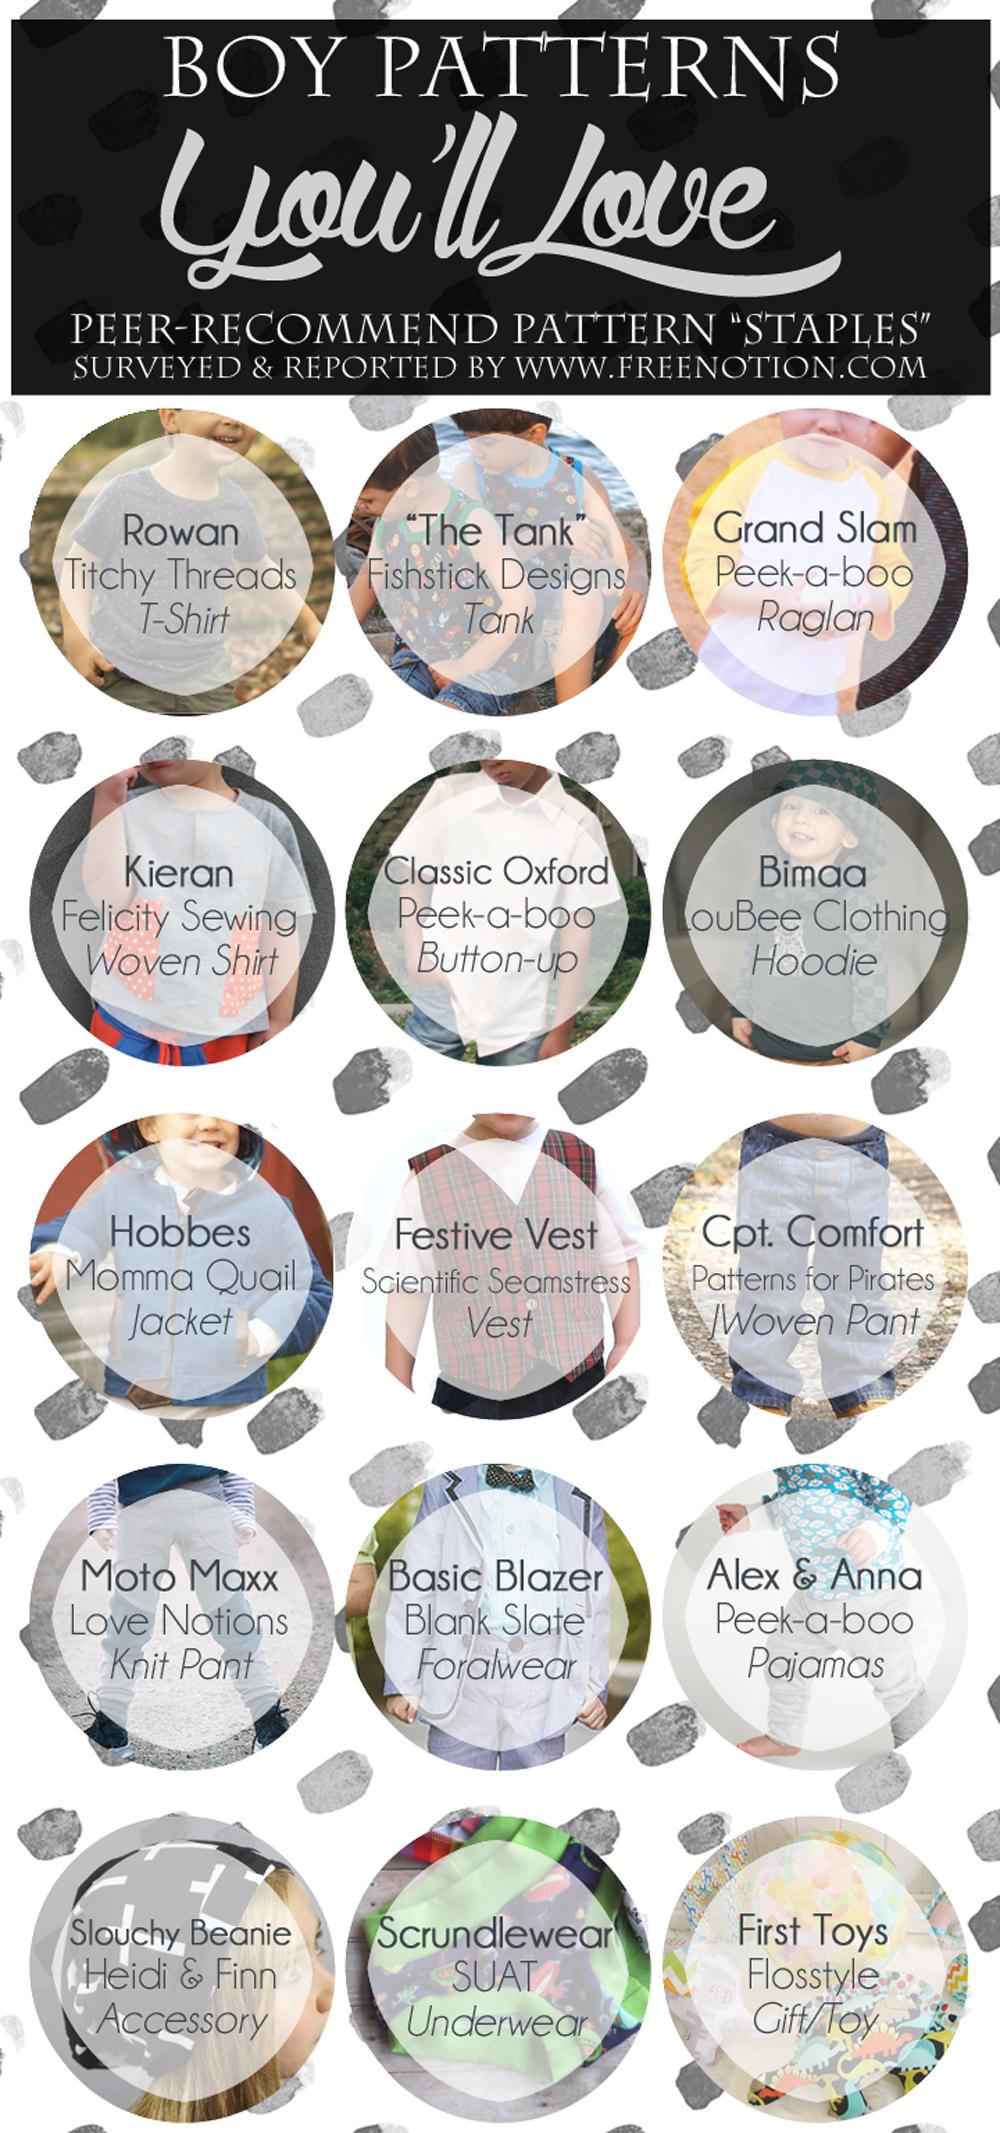 Rowan T-shirt/The Tank/Grand Slam Raglan/Kieran/Classic Oxford/Bimaa/Hobbes Hooded Jacket/Festive Vest/ Cpt. Comfort / Moto Maxx / Basic Blazer / Alex & Anna / Slouchy Beanie / Scrundlewear / First Toys